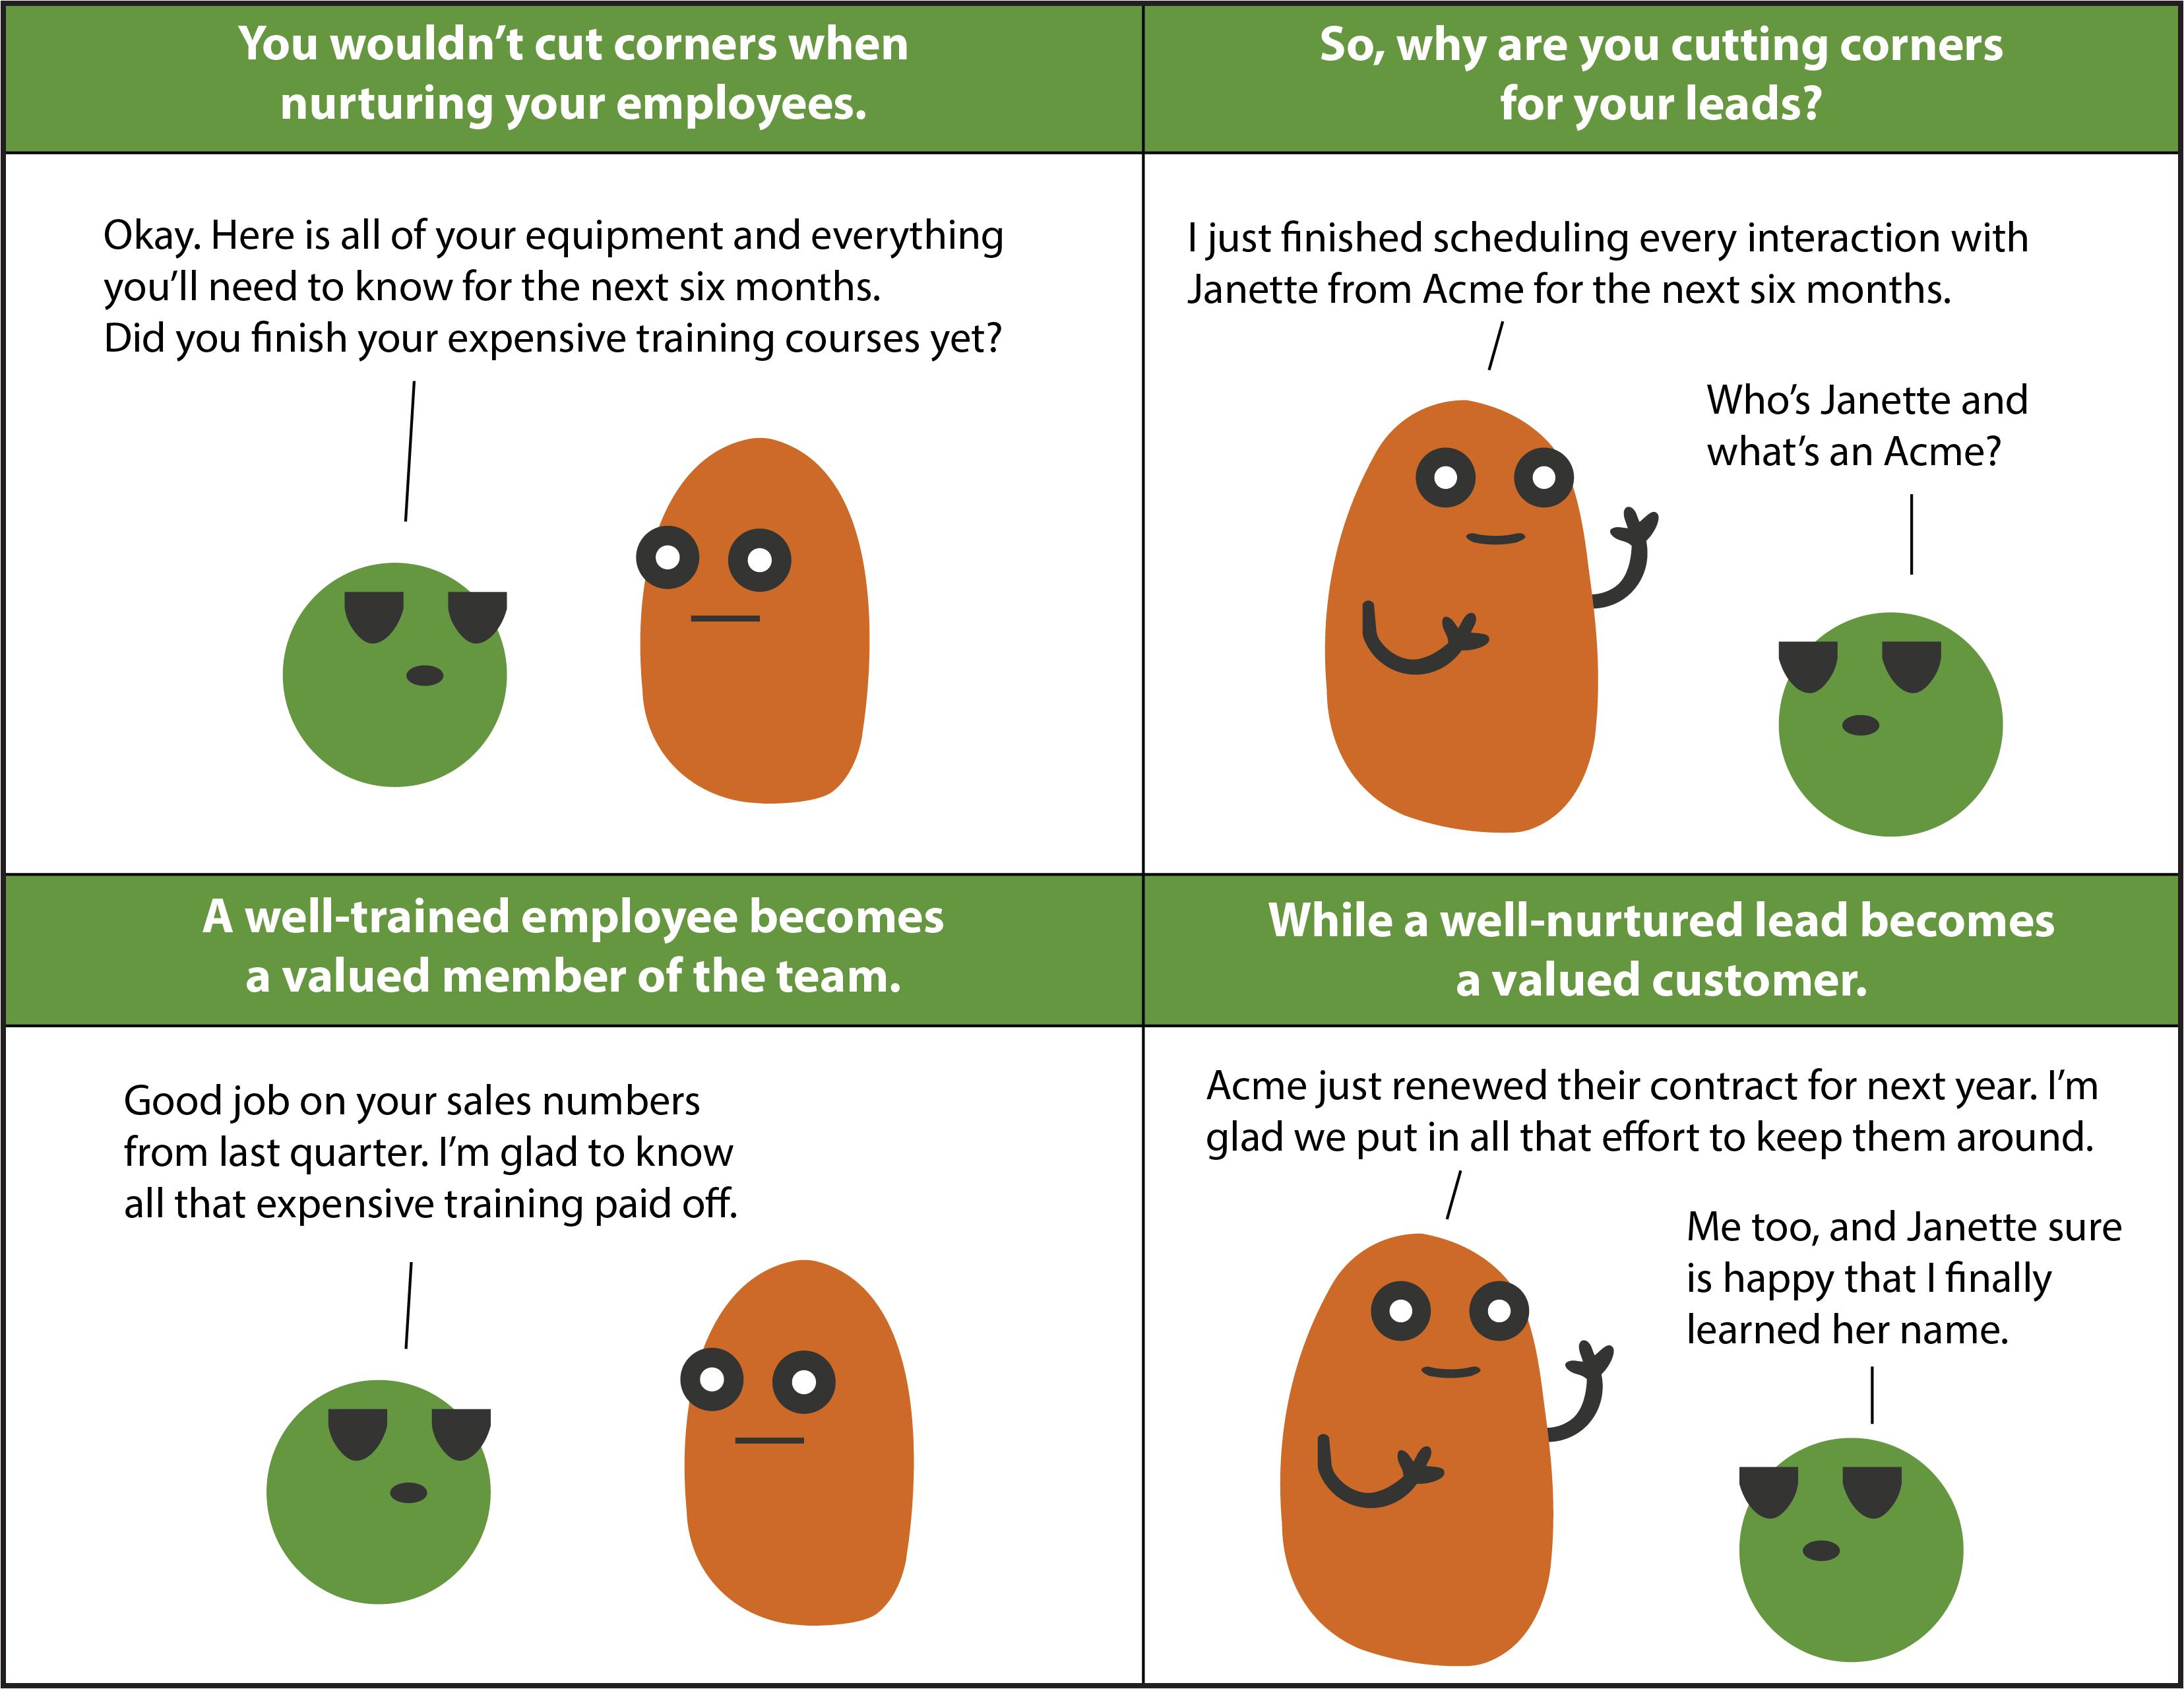 Acadia blob comic explaining how nurturing an employee is similar to nurturing a lead